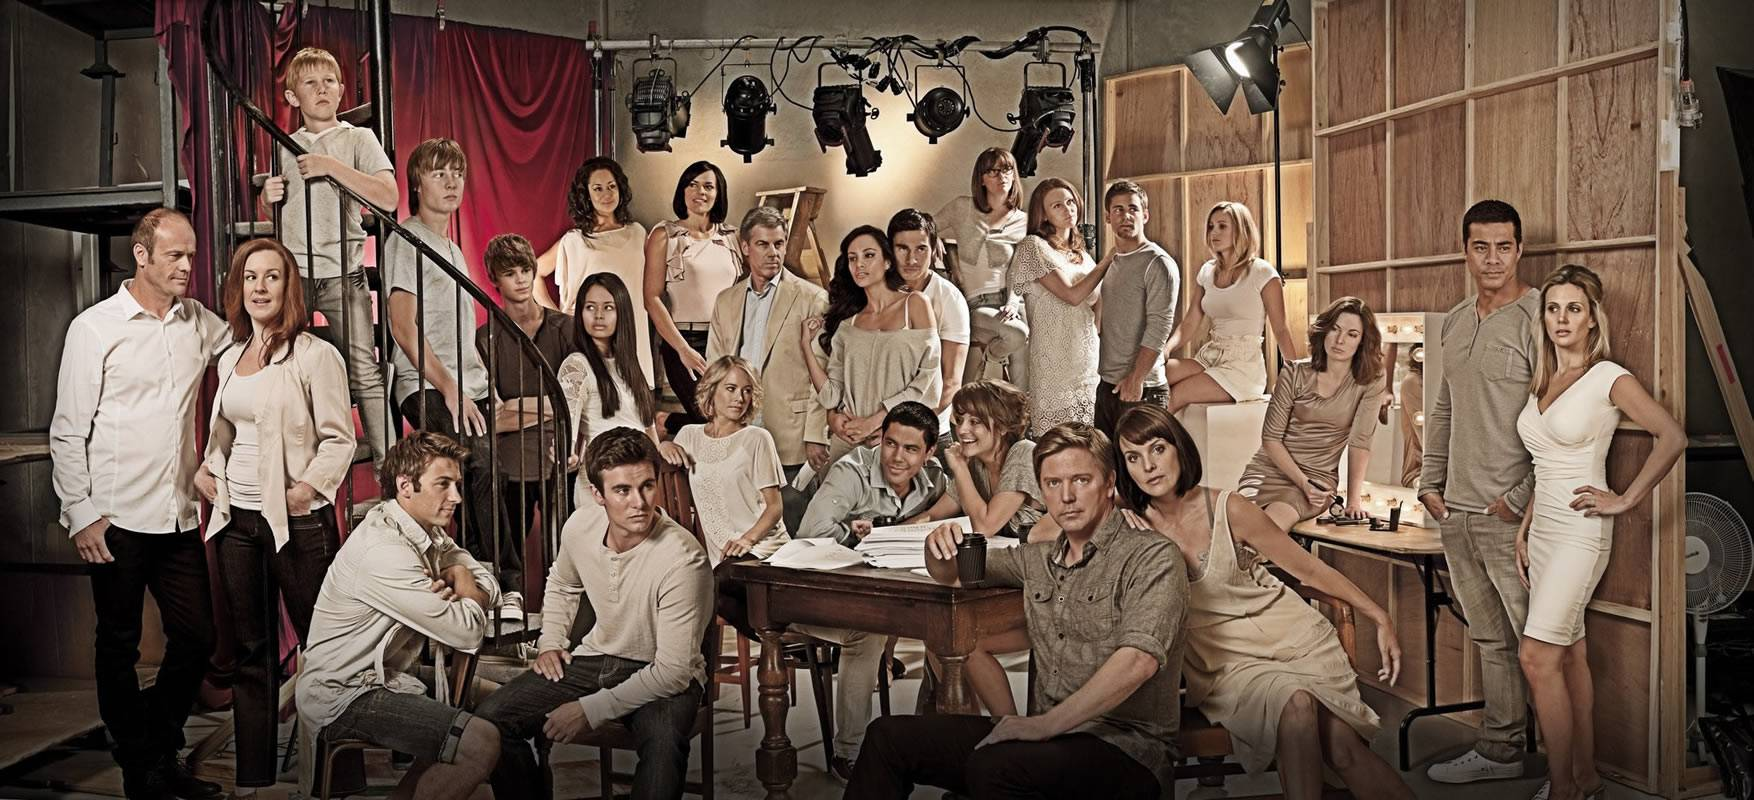 Shortland Street cast: photo shoot 2011